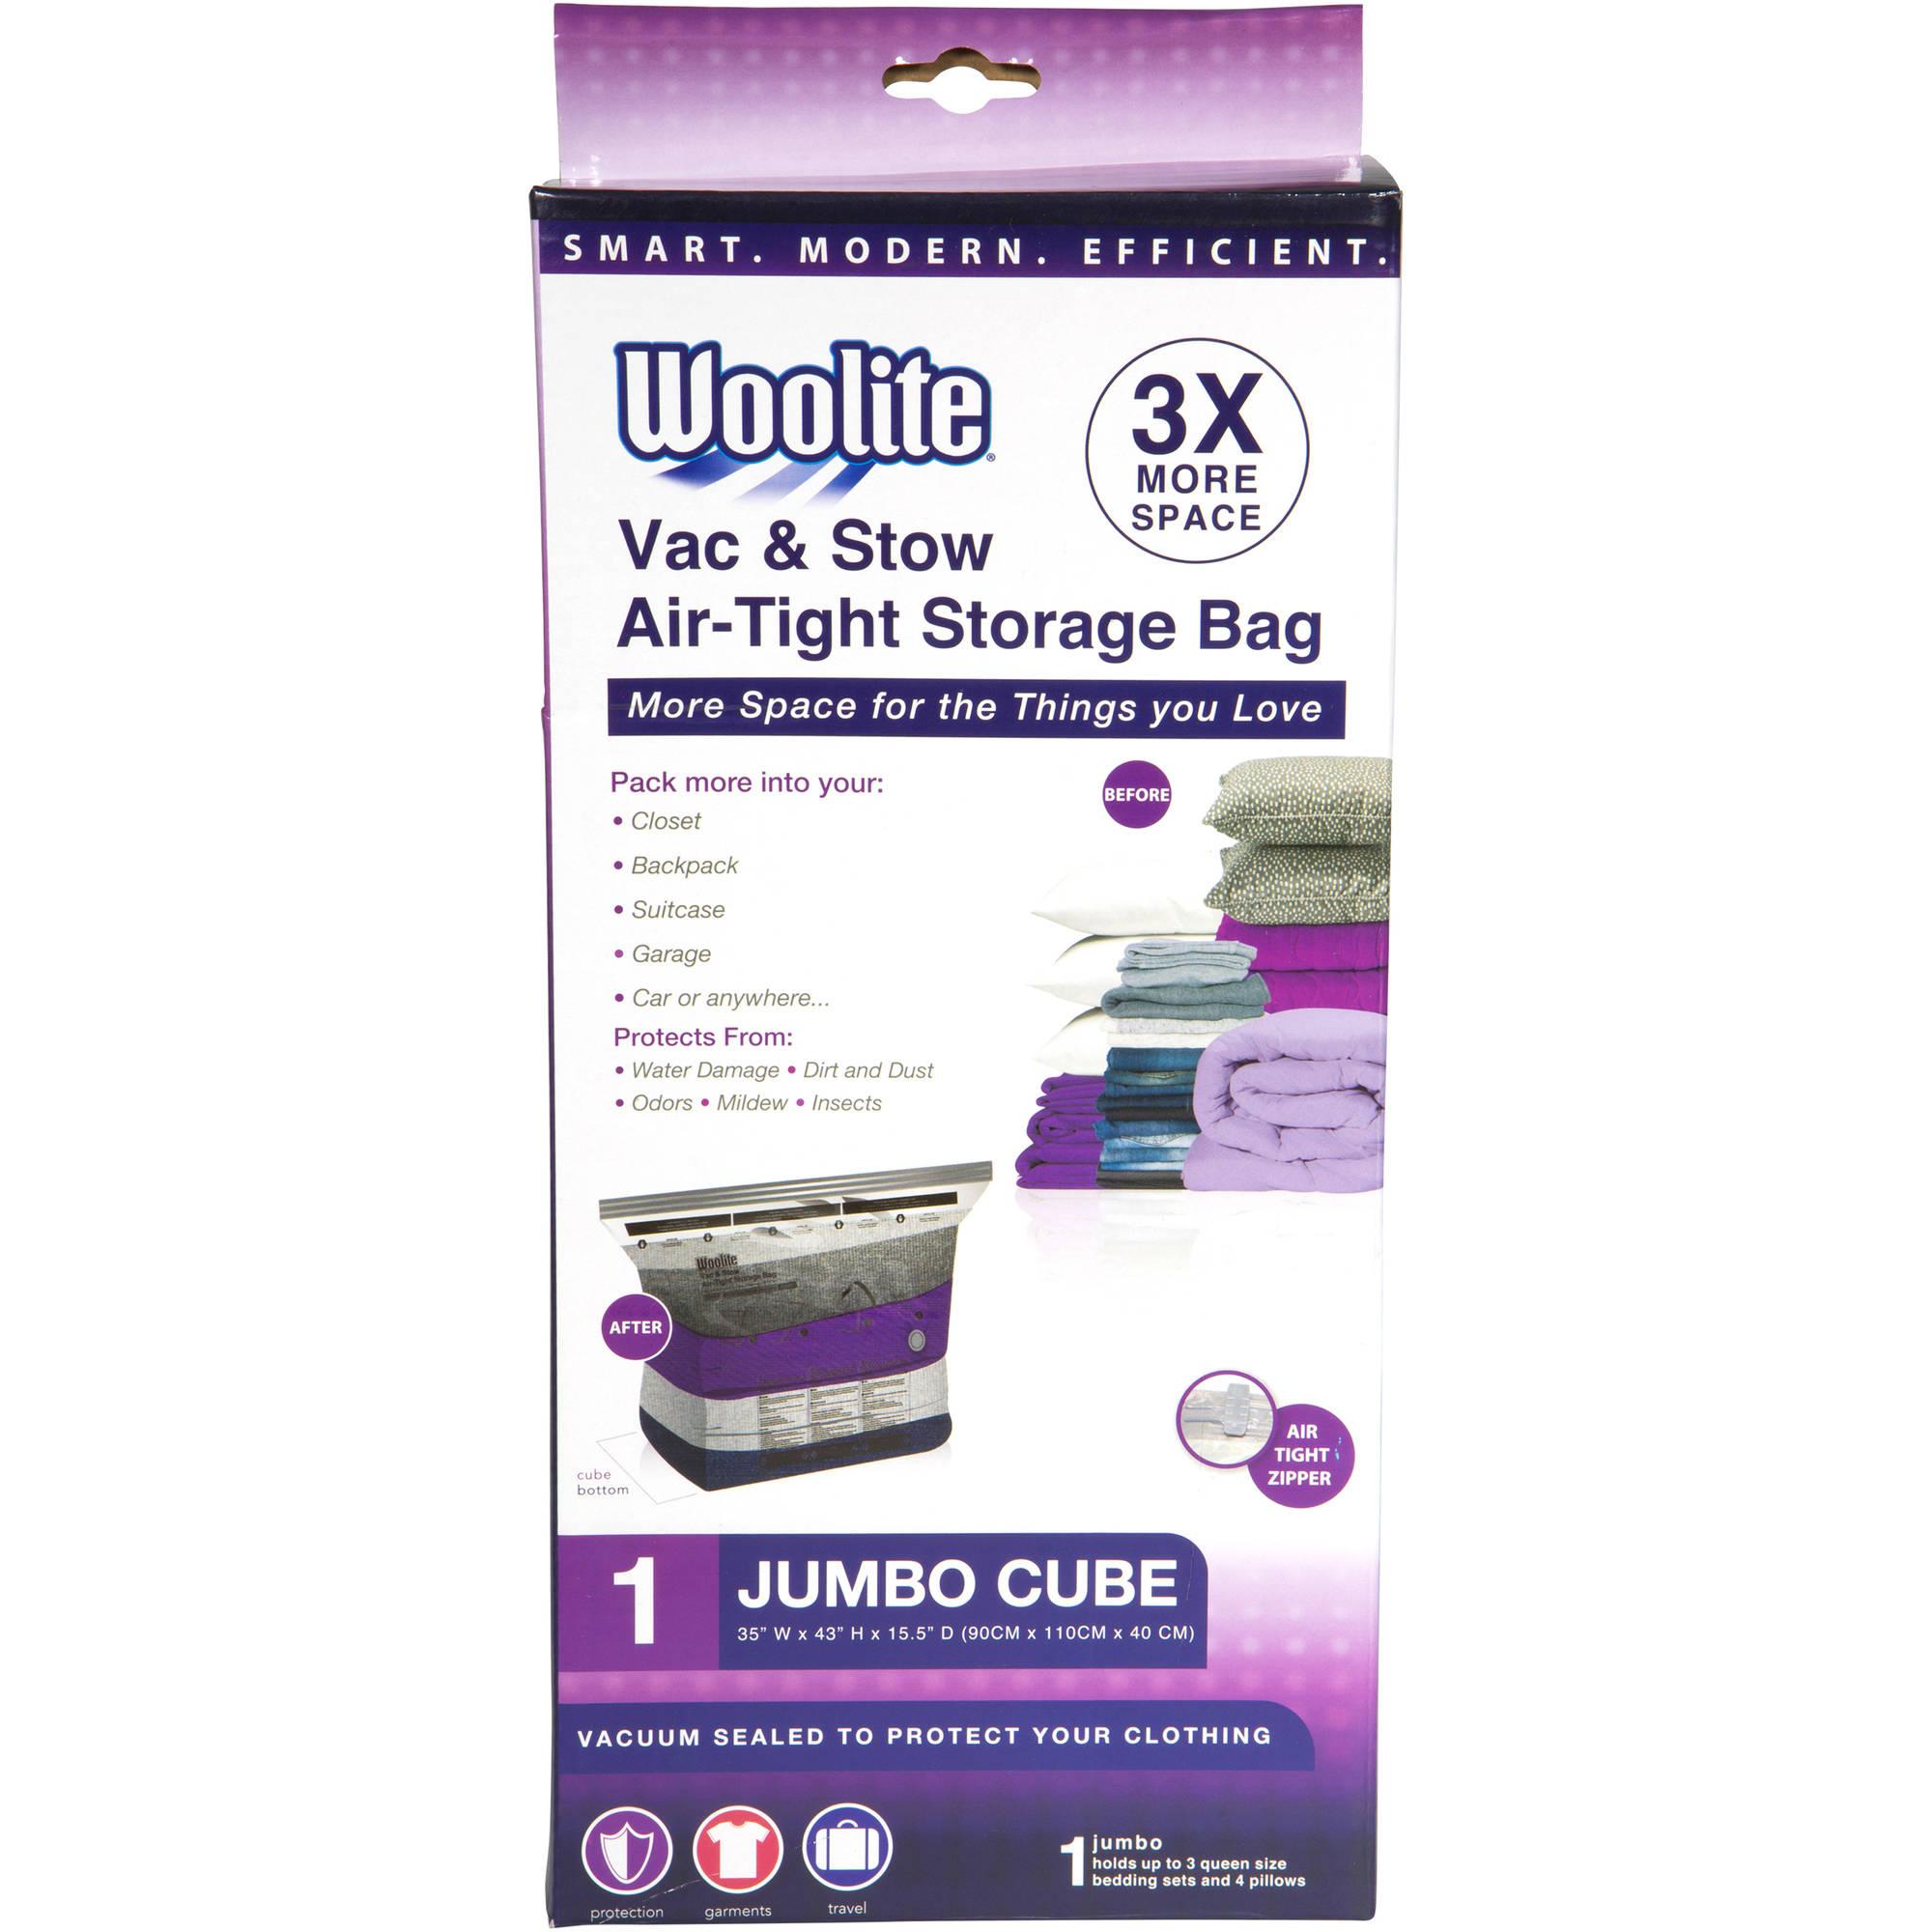 "Woolite 1-Piece Cube Jumbo Vacuum Storage Bag, 35"" x 43"" x 15.5"""